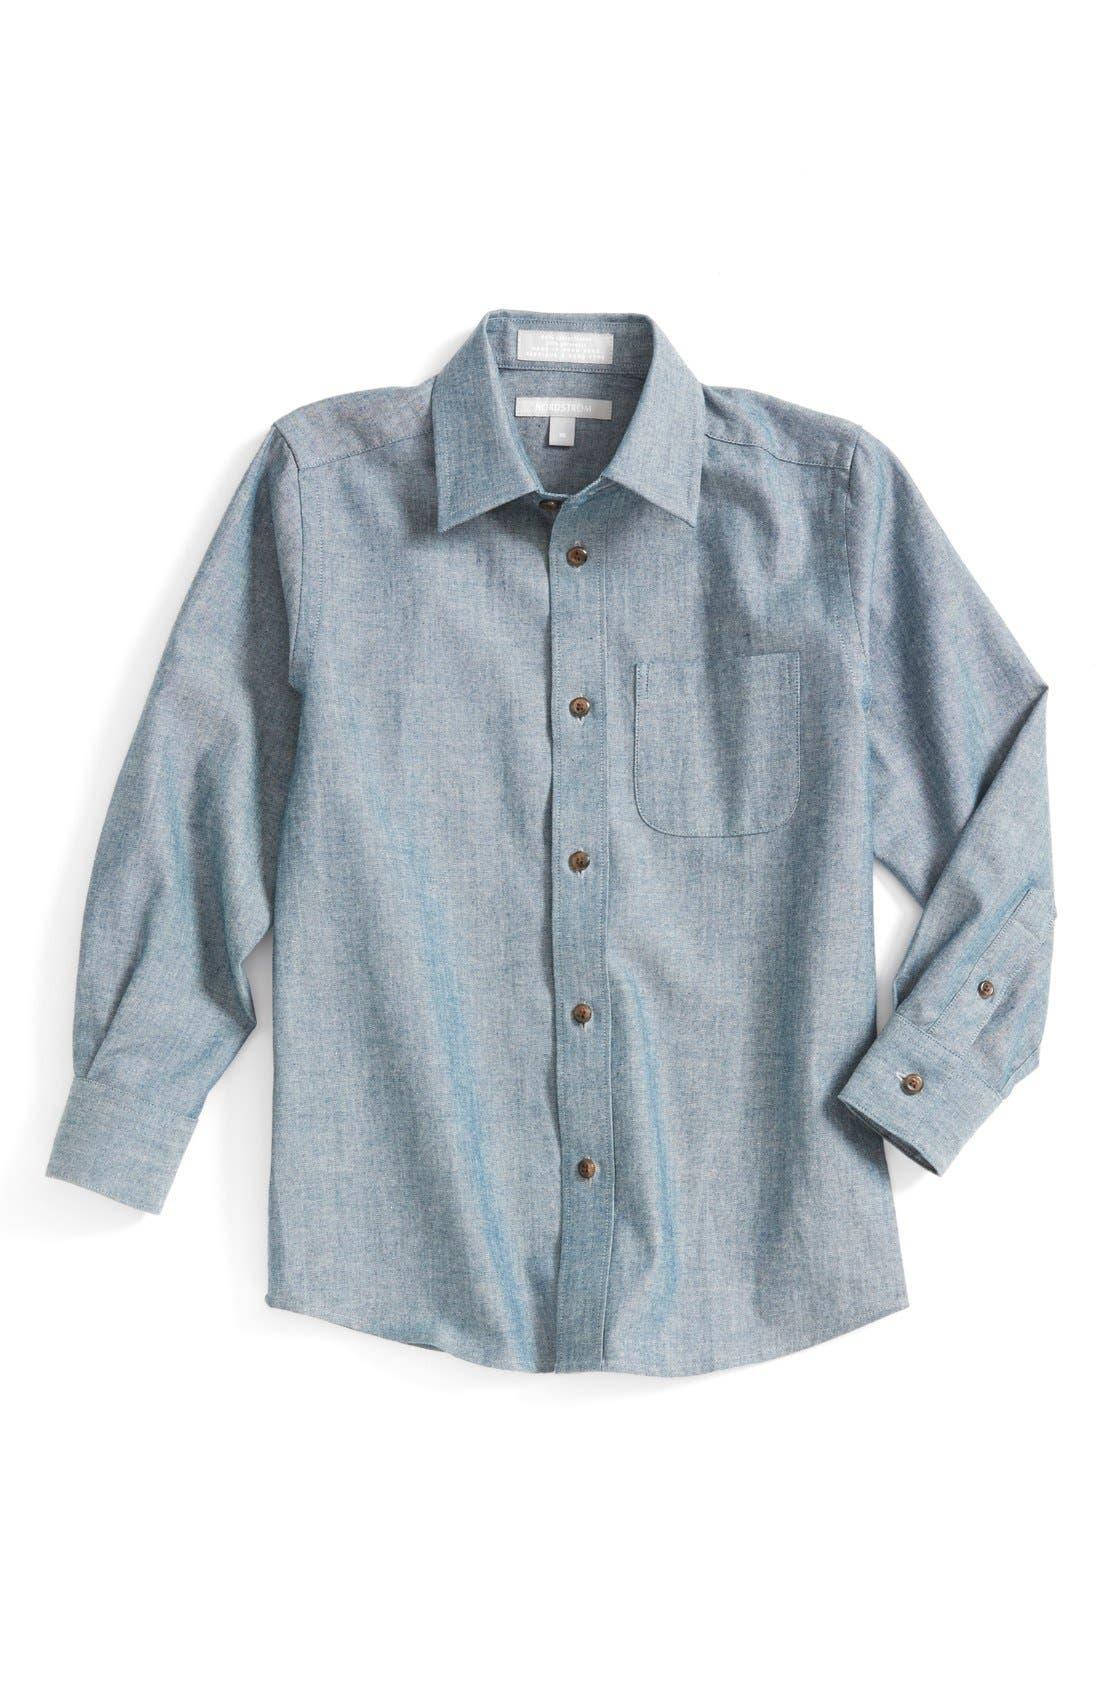 Alternate Image 1 Selected - Nordstrom 'Edgar' Cotton Chambray Shirt (Toddler Boys & Little Boys)